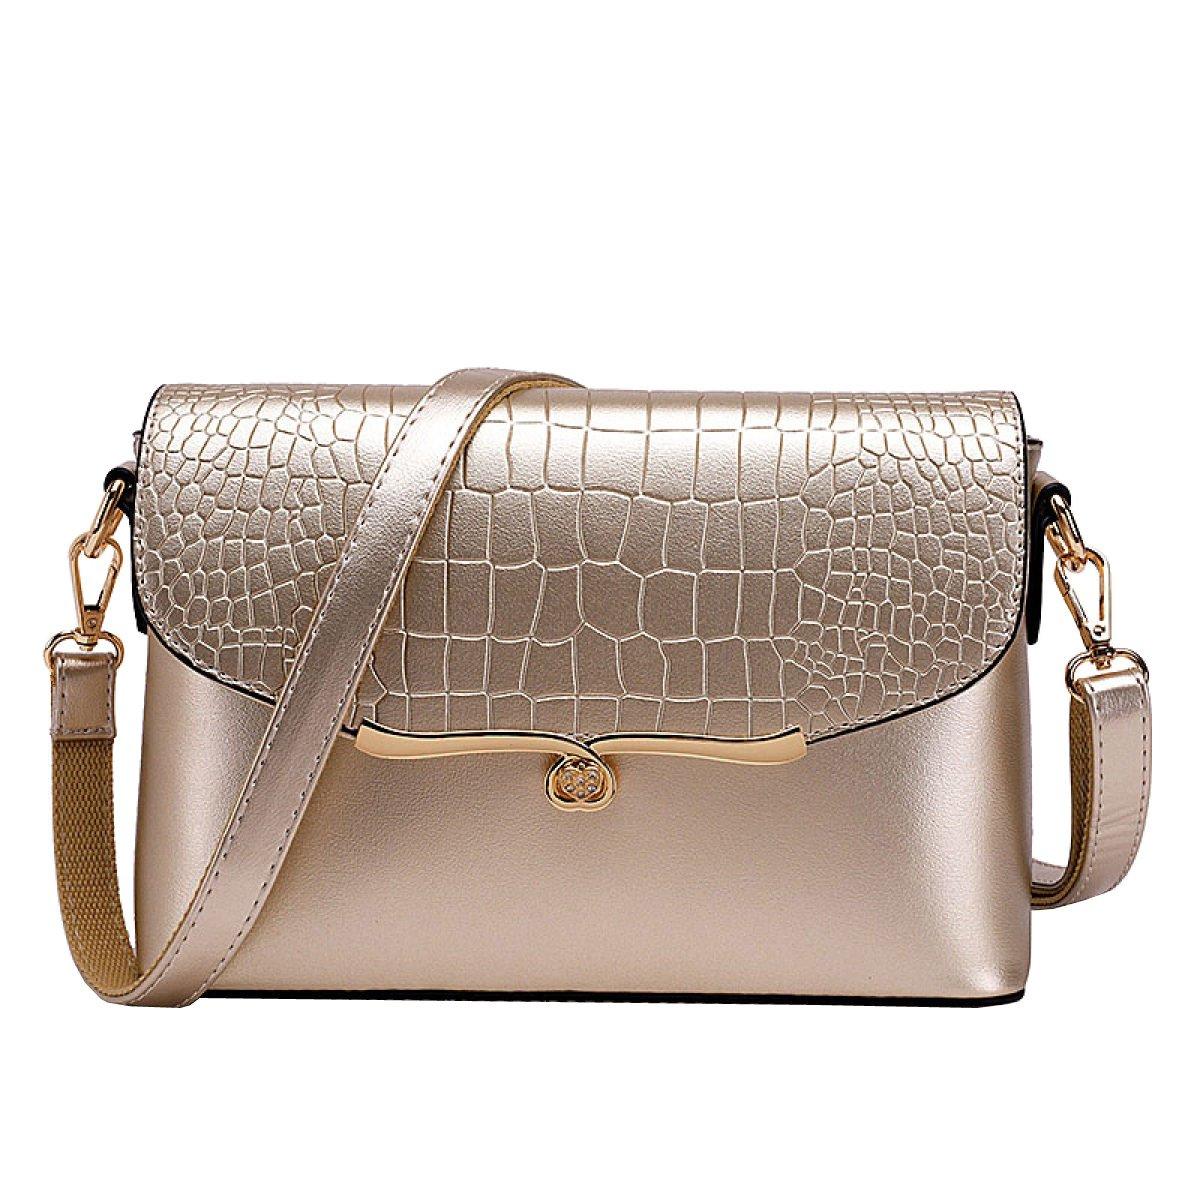 LAIDAYE Women Bag Handbag Bag Messenger Bag Single Shoulder Bag Bright Skin Ladies Bag Multi-color Optional Upgrade